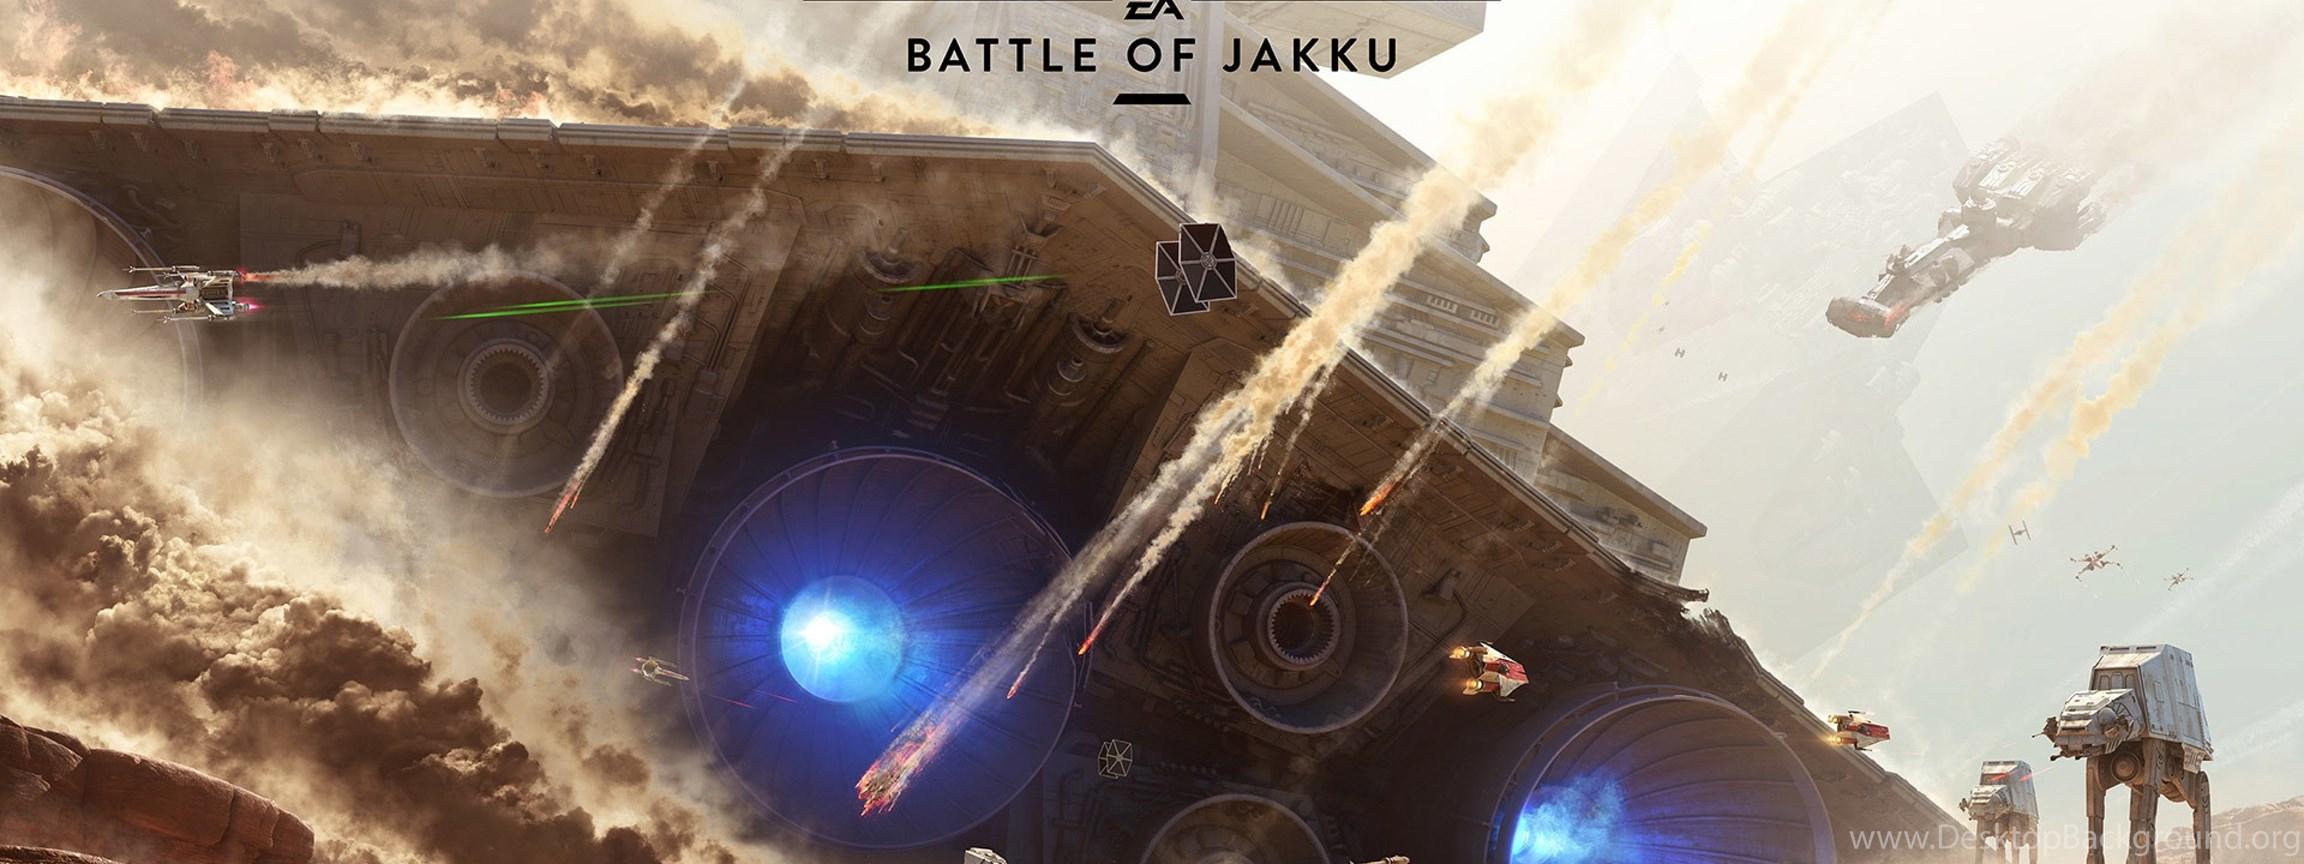 Download Wallpapers 3840x2160 Star Wars Battlefront Battle Of